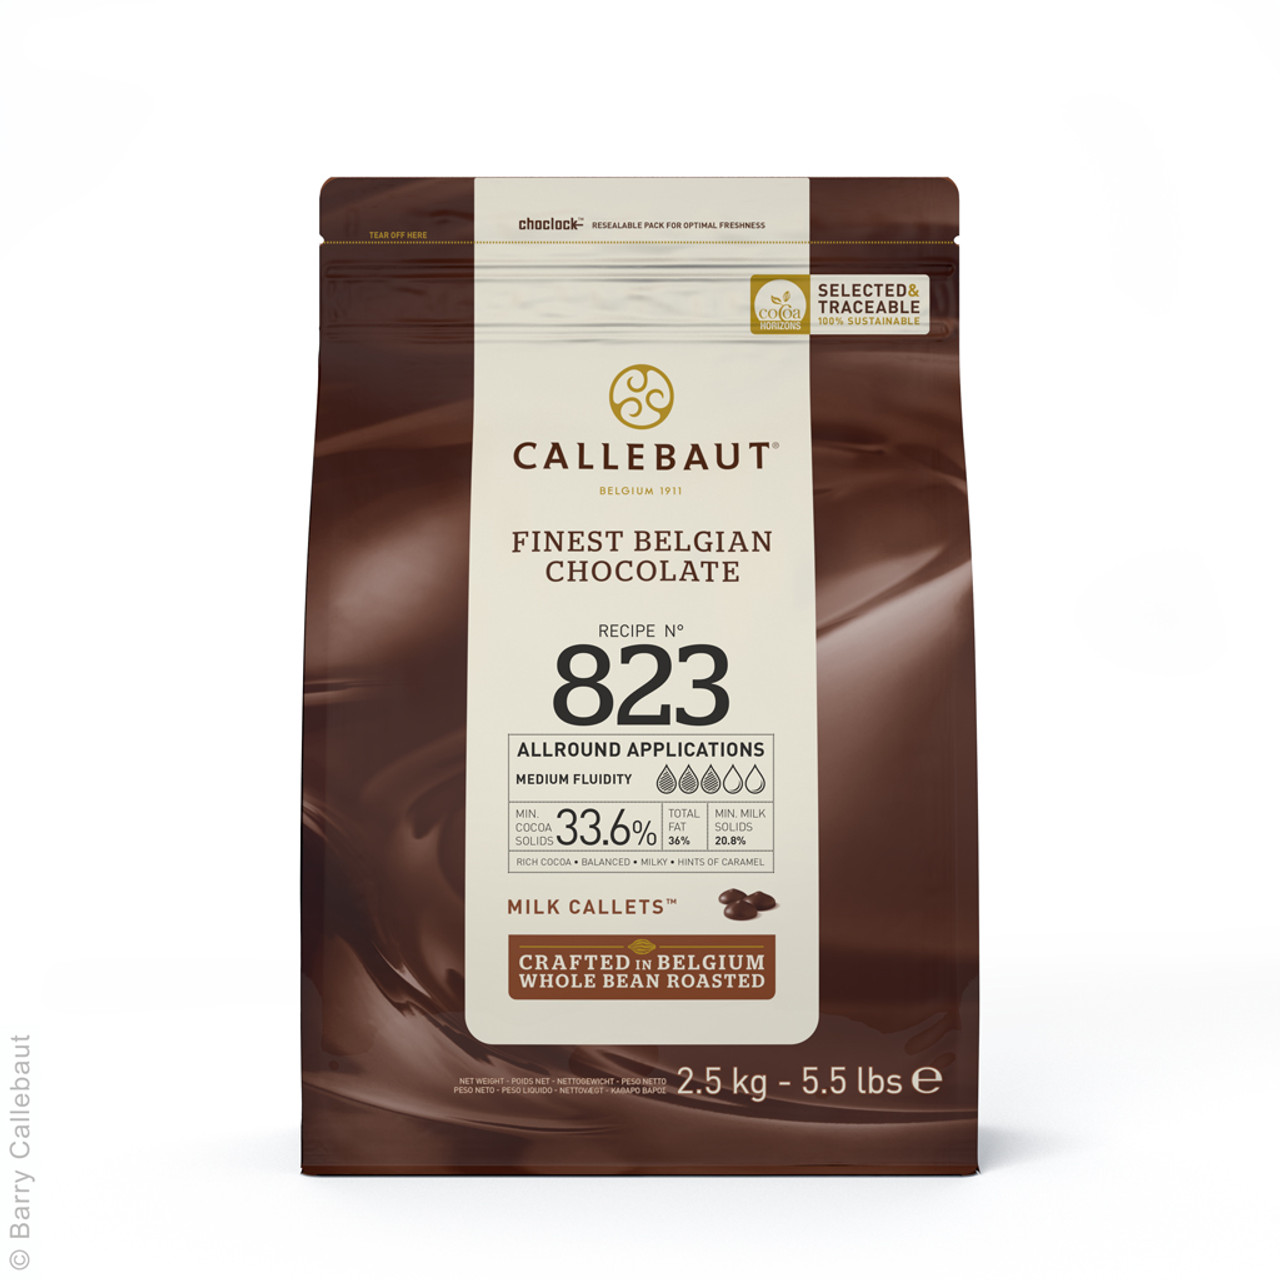 CALLEBAUT MILK CALLETS 33.6% 2.5kg